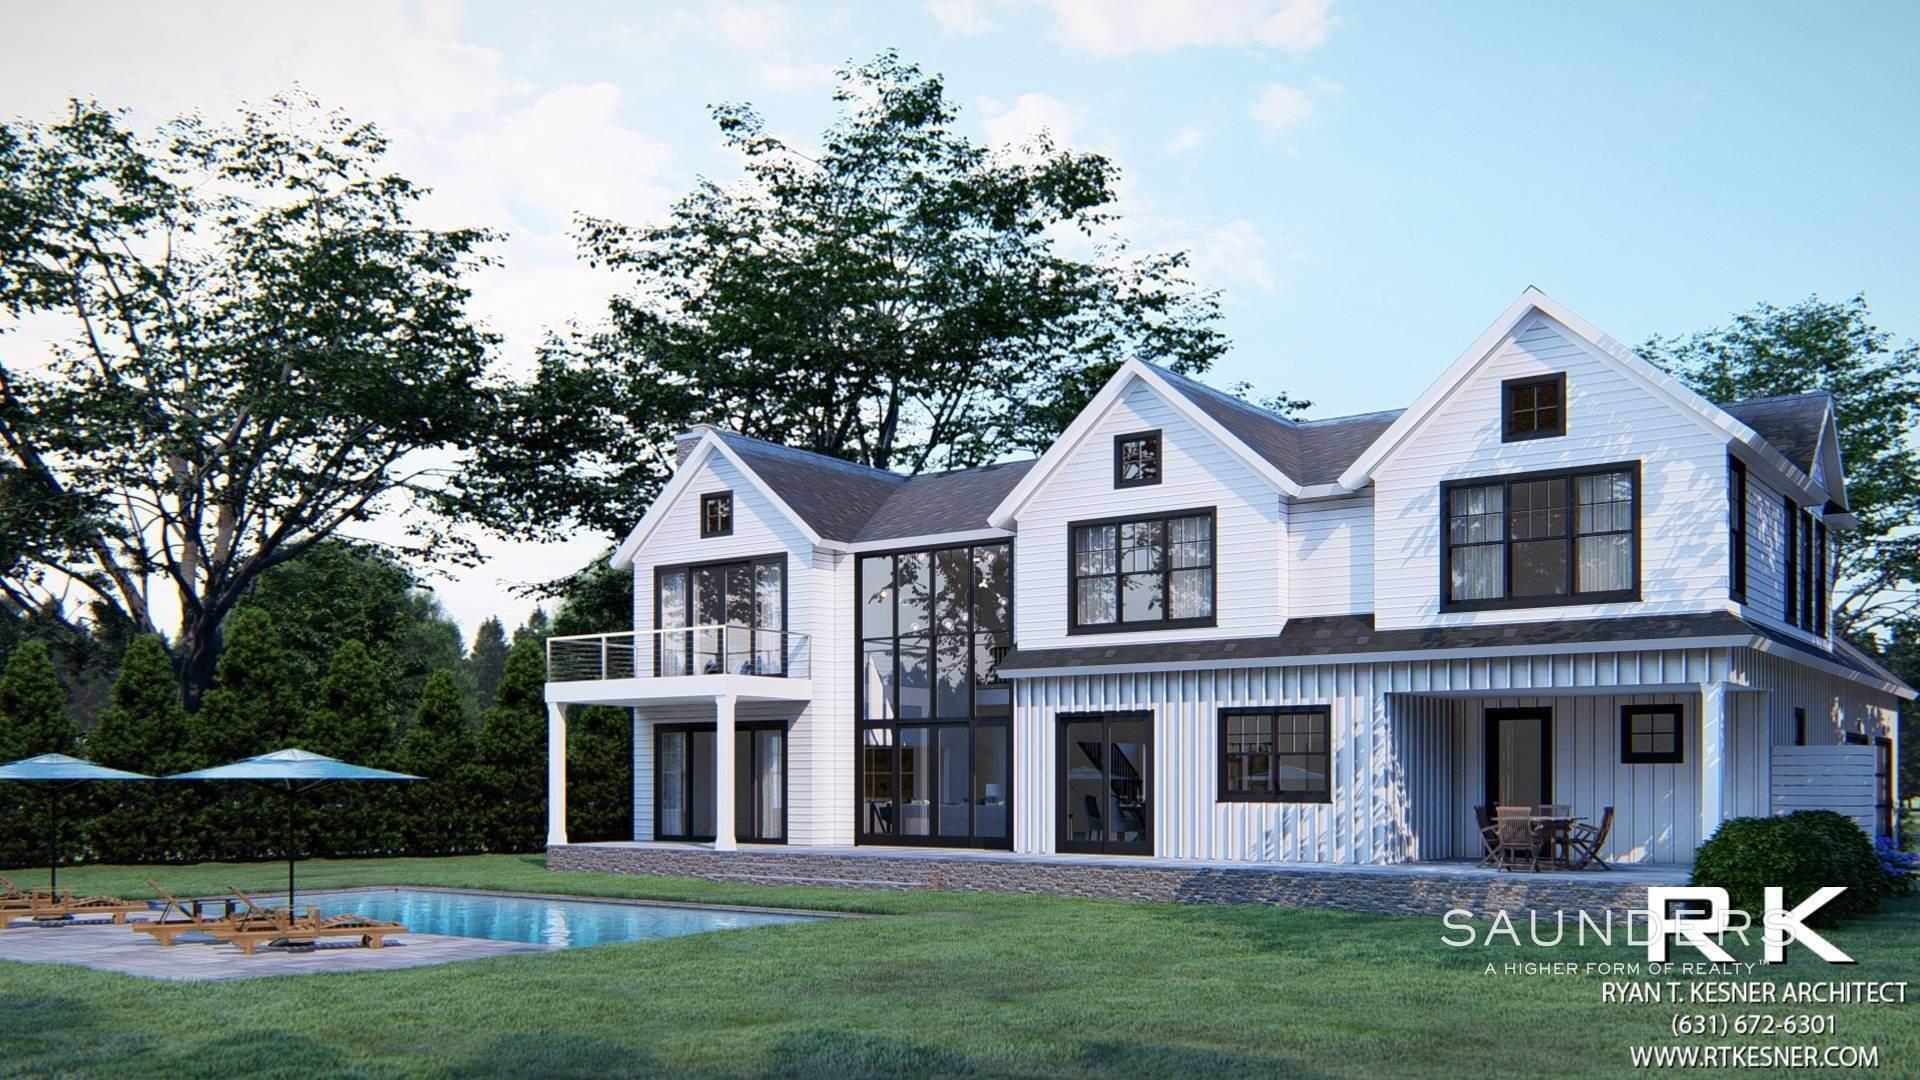 7. Land for Sale at Rare Prime Building Lot In Bridgehampton Bordering Reserve 30 Fair Hills Lane, Bridgehampton, Southampton Town, NY 11932